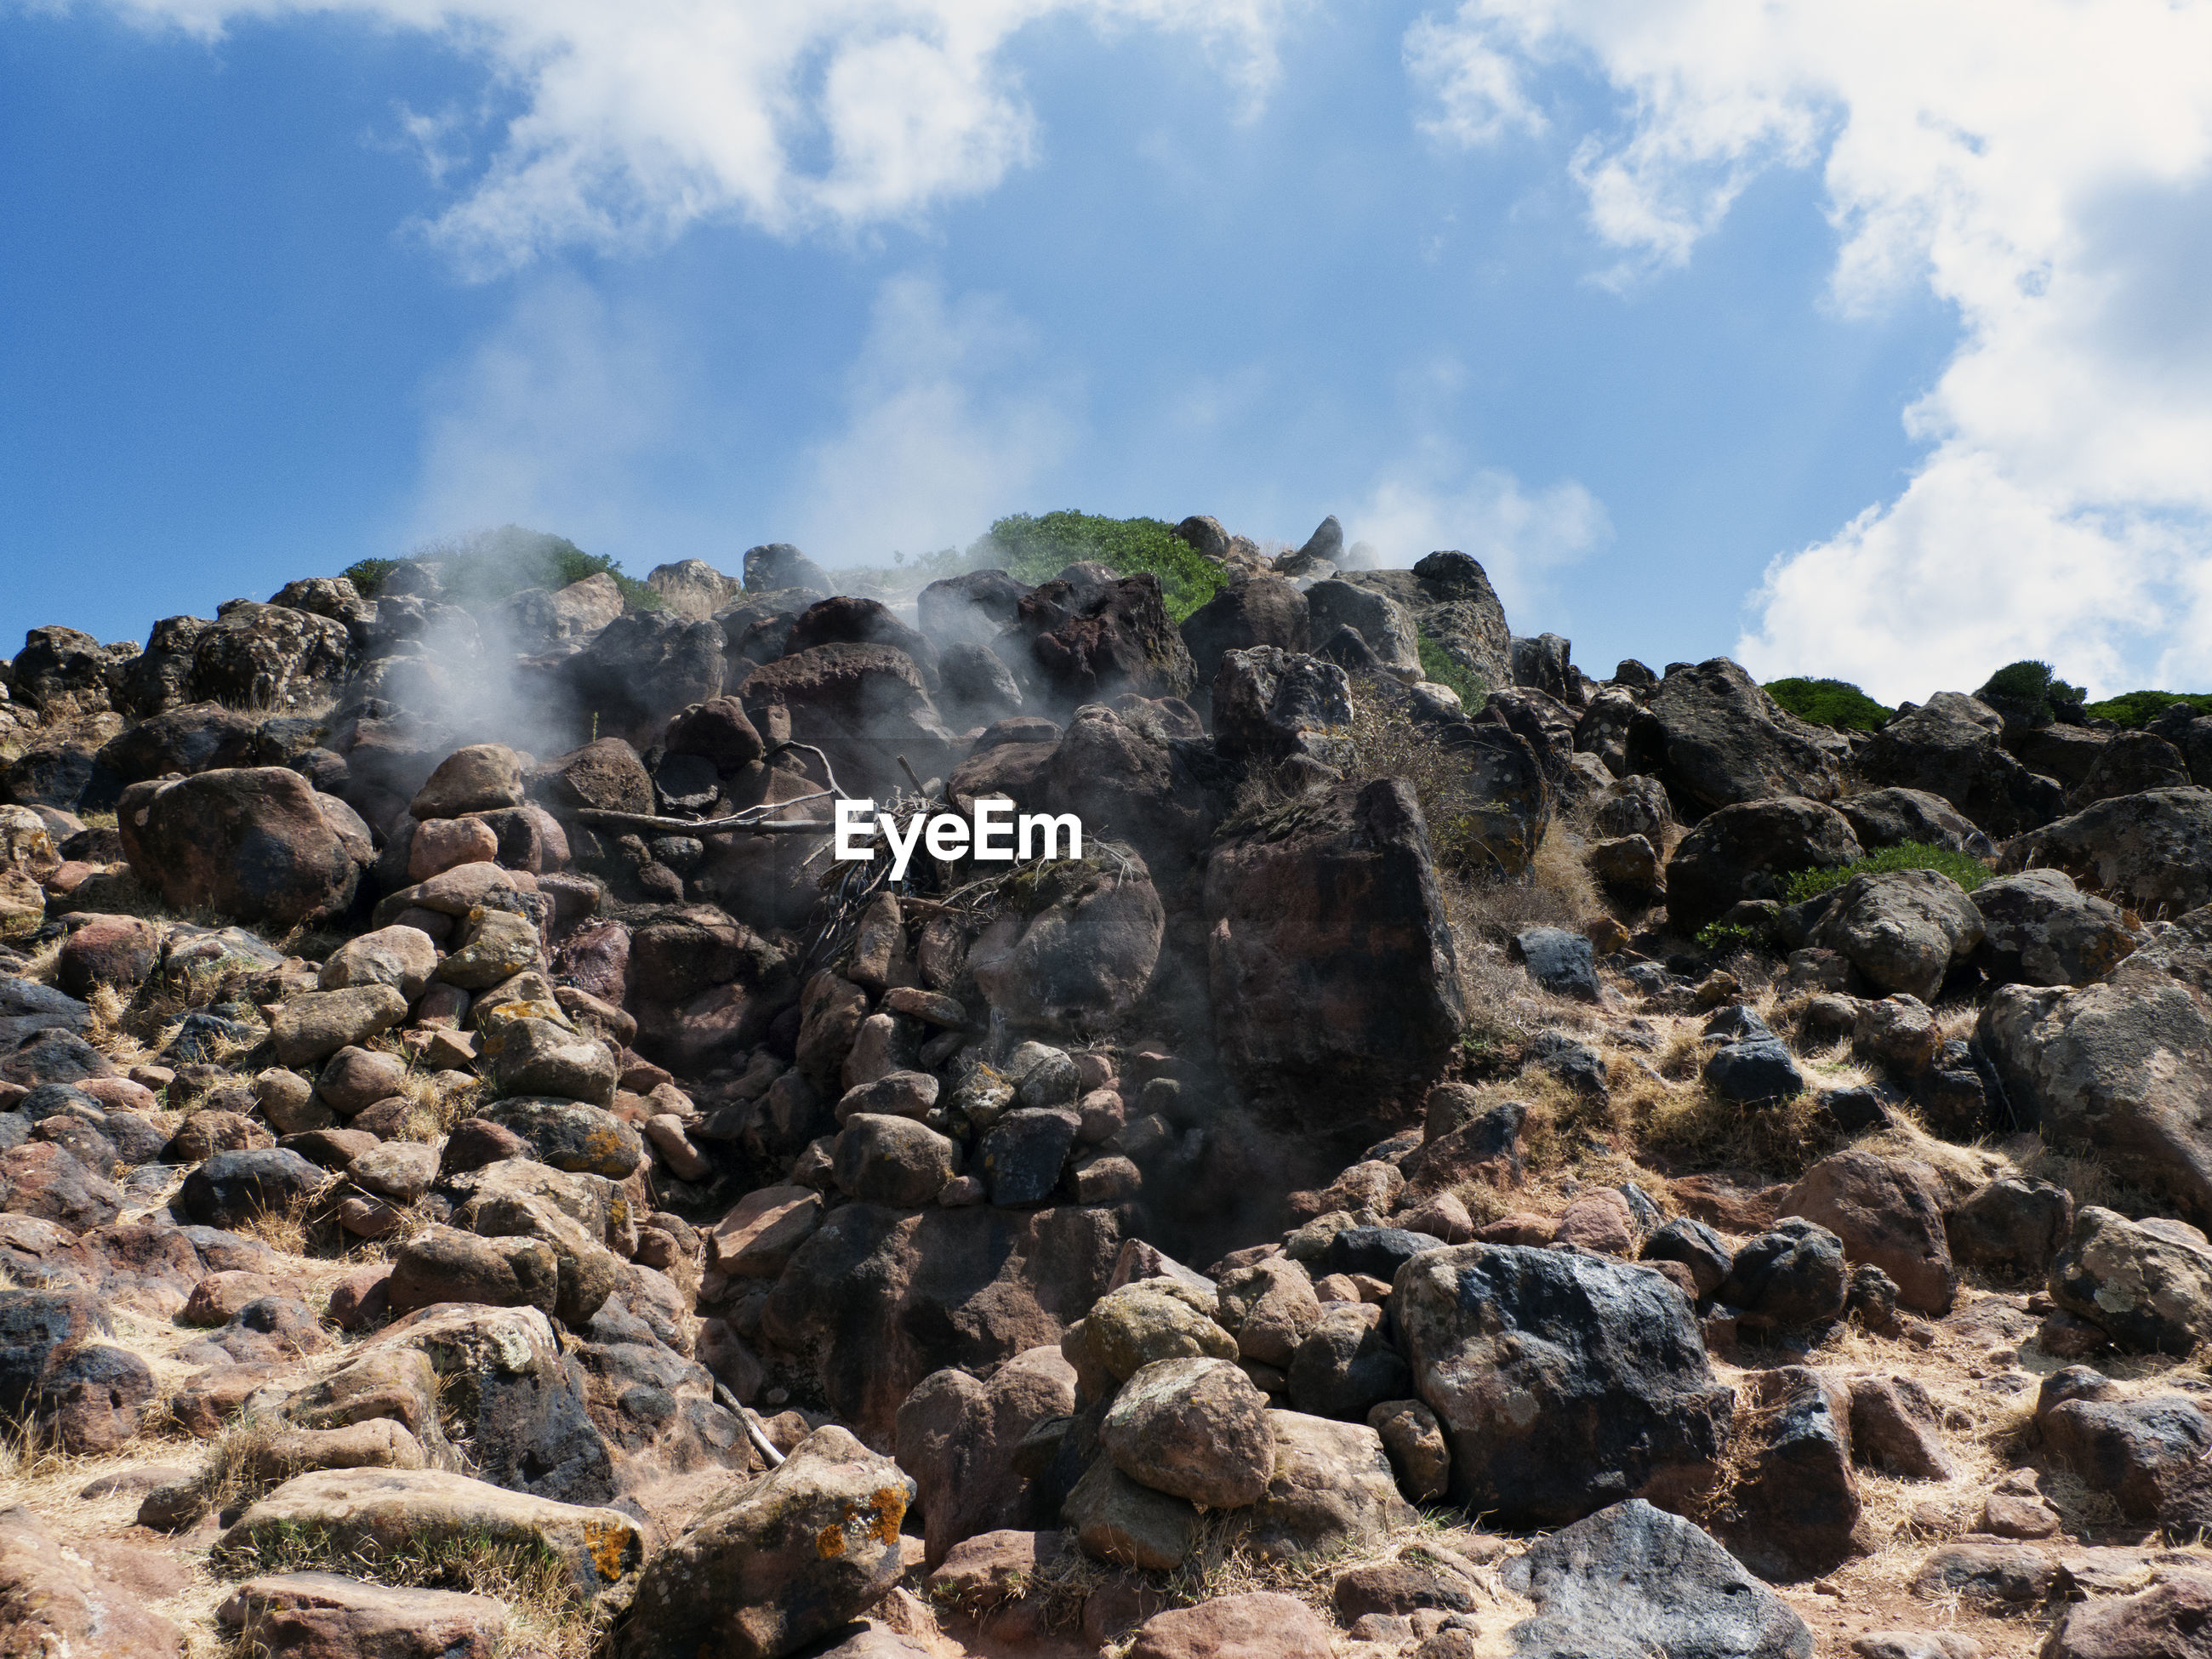 SCENIC VIEW OF ROCKS